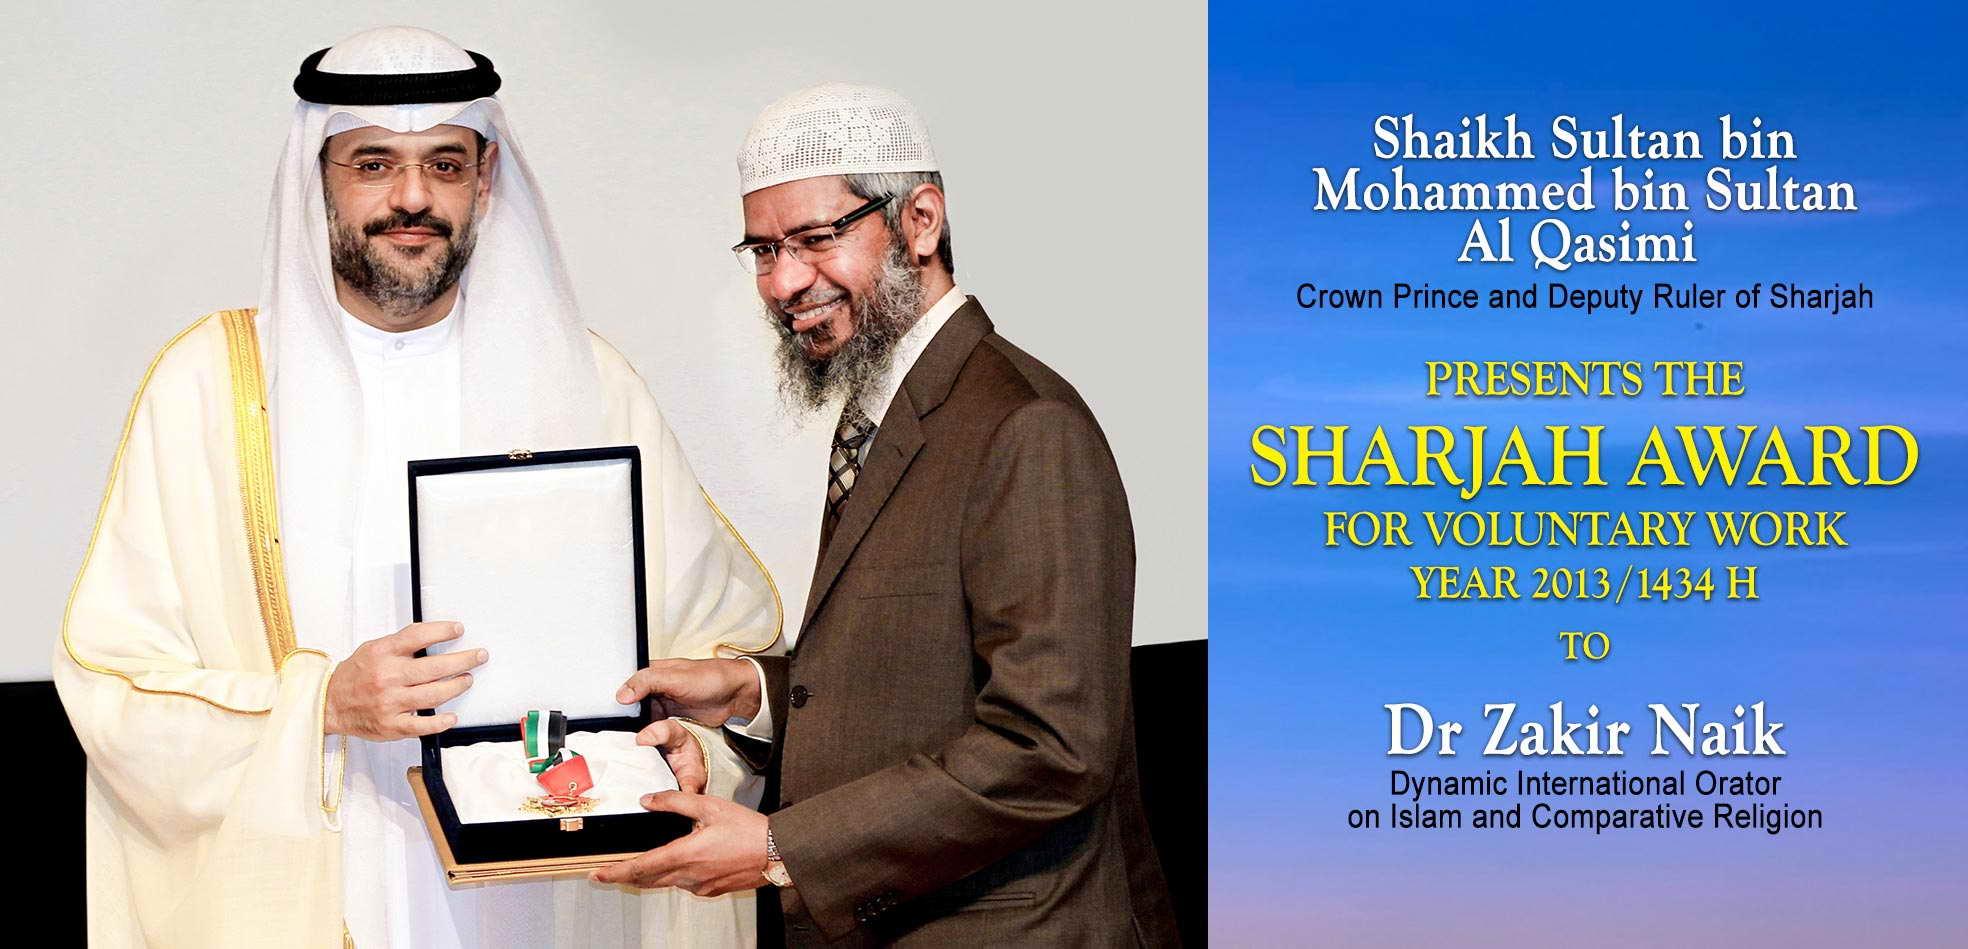 Sharjah Award for Voluntary Work - 2013